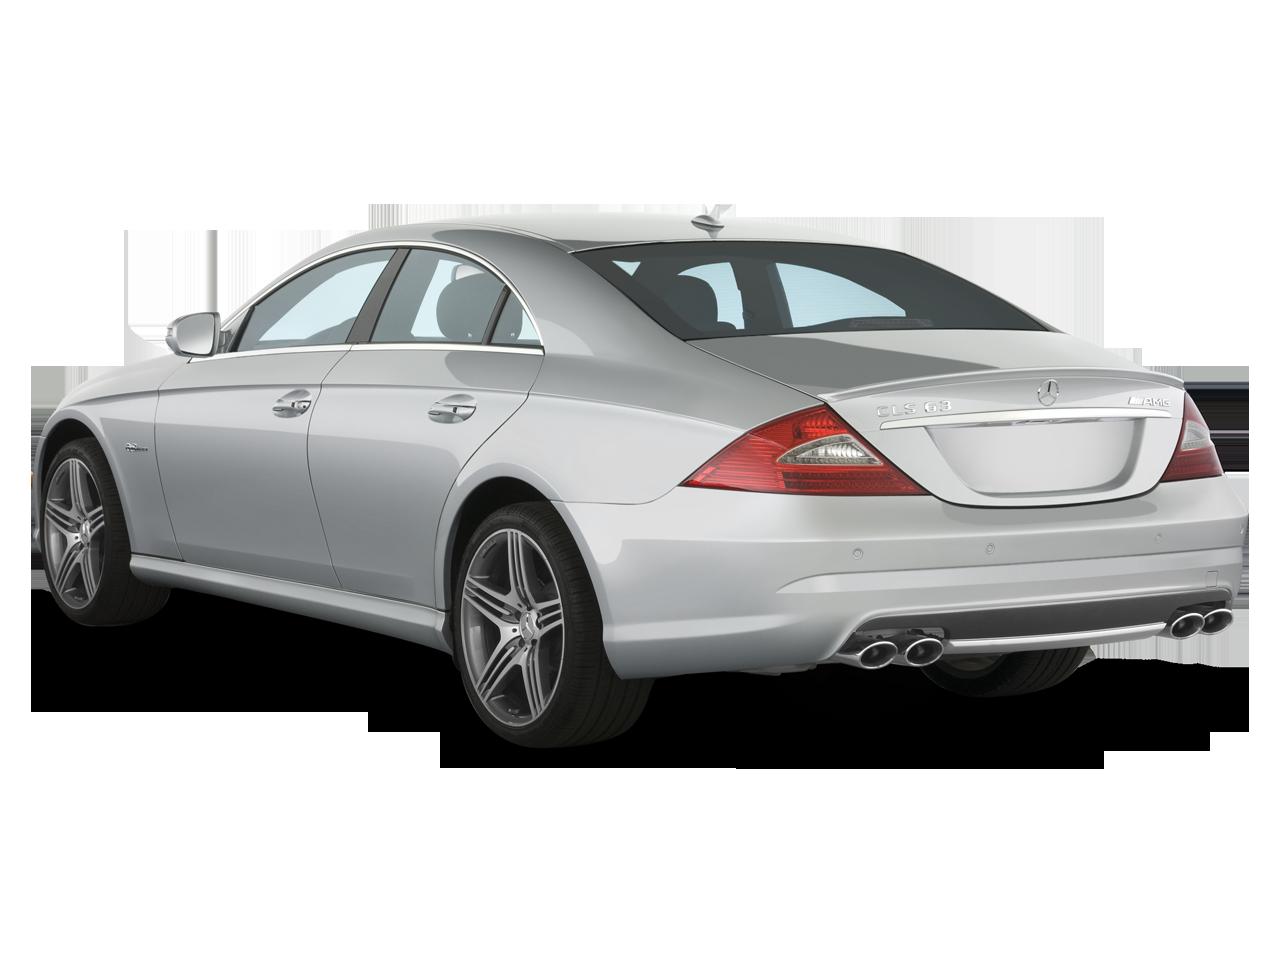 2009 mercedes benz cls63 amg mercedes benz luxury sedan review automobile magazine. Black Bedroom Furniture Sets. Home Design Ideas